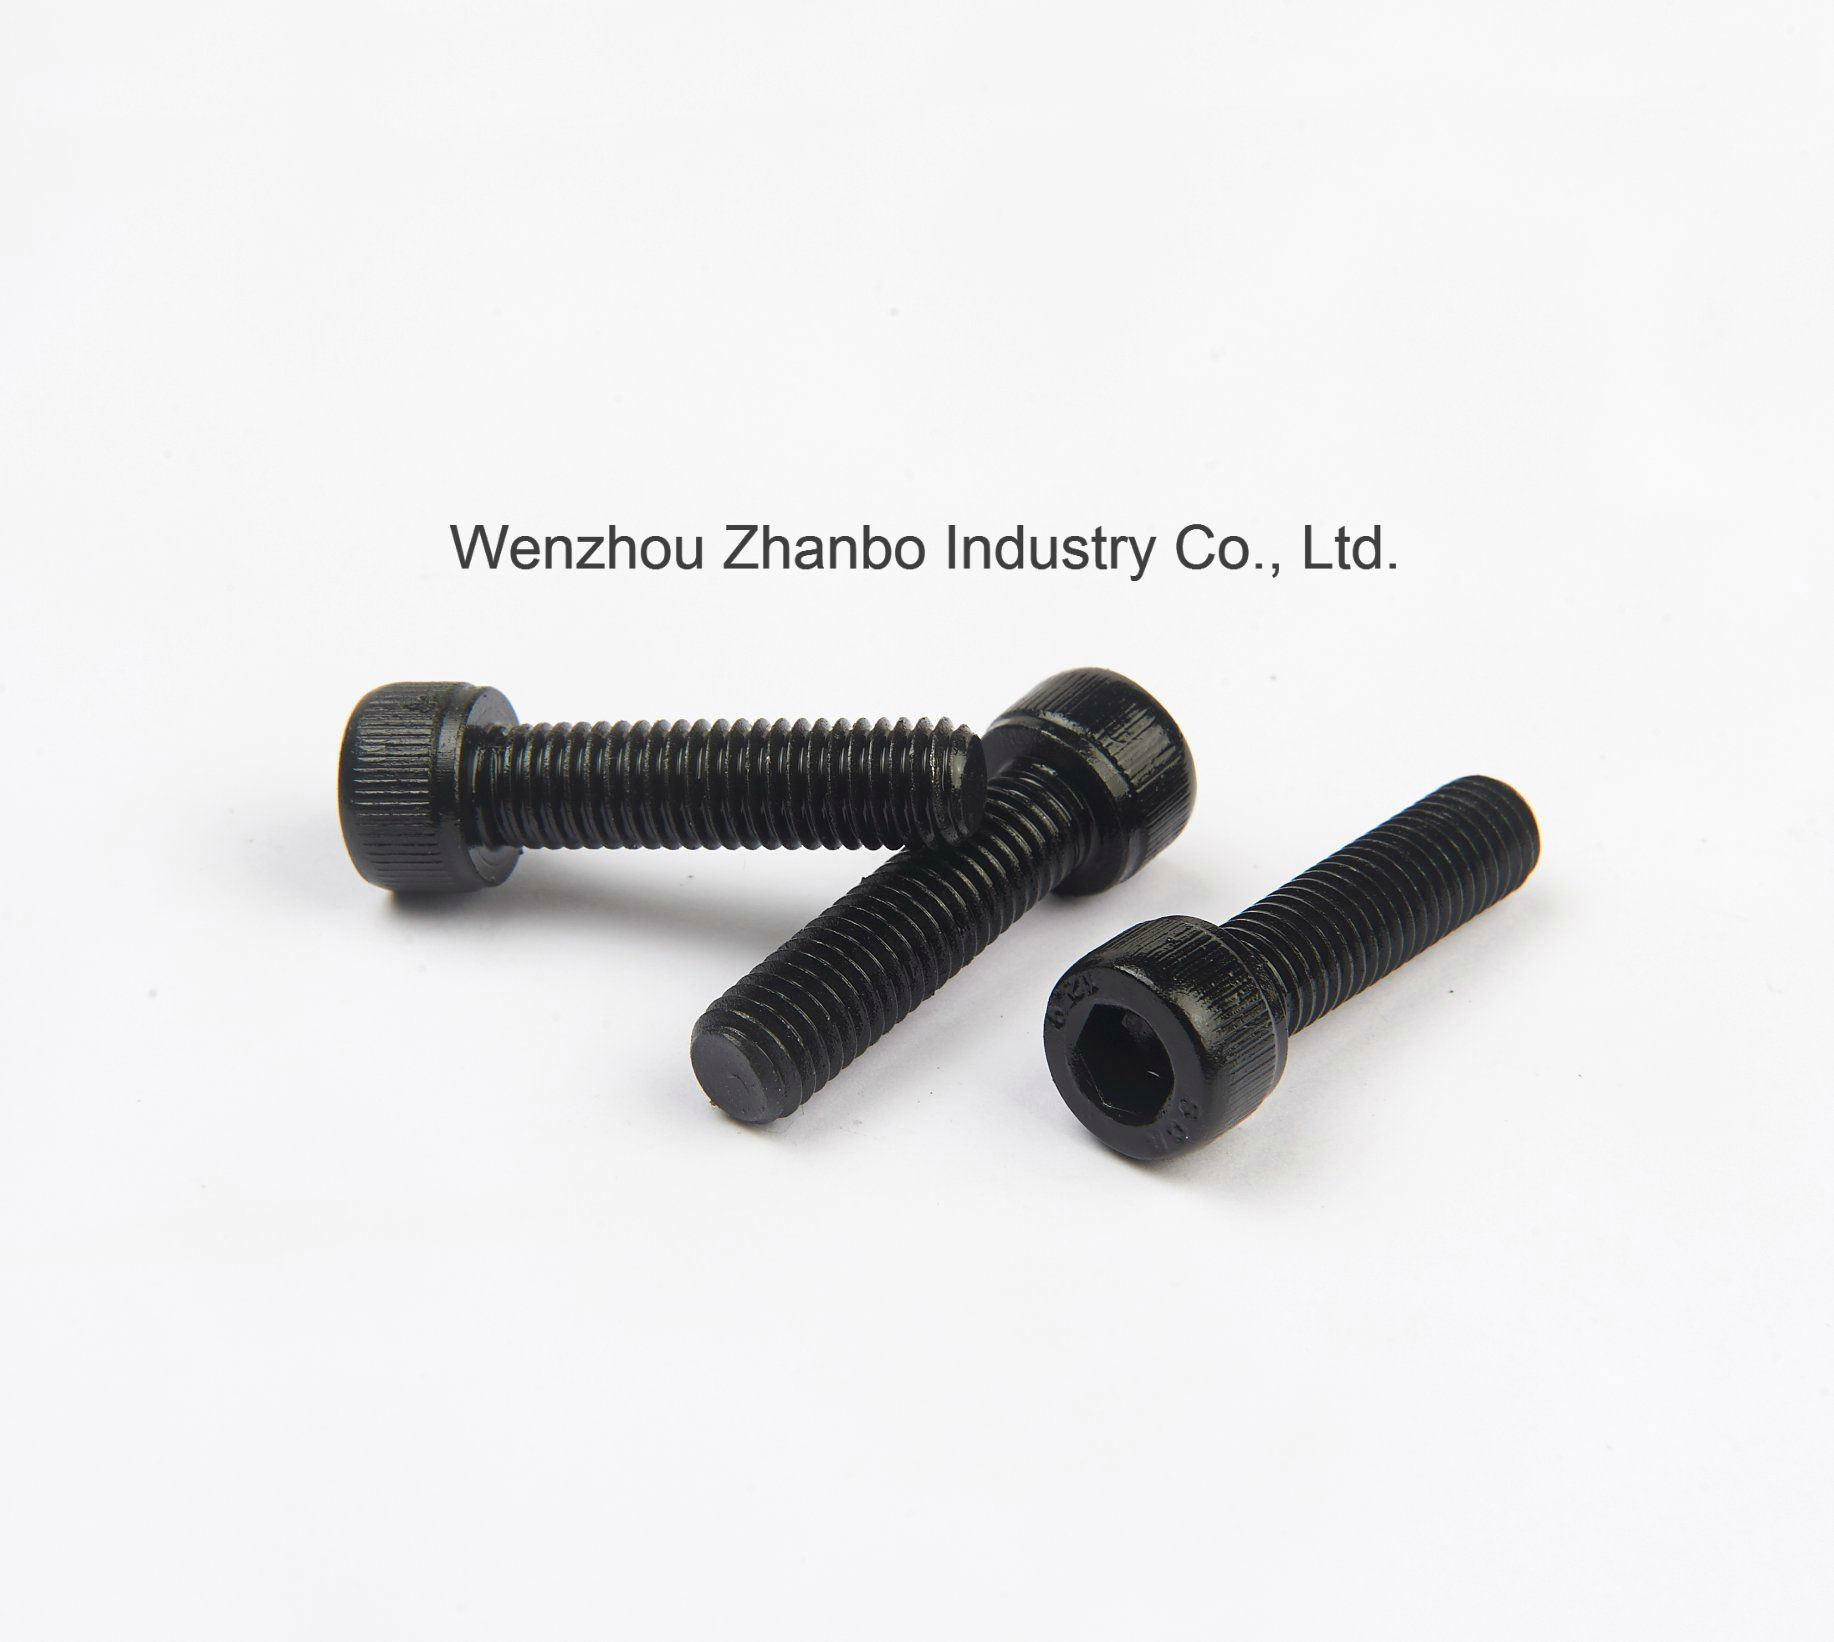 High Strength Steel, Hexagon Socket-Head Cap Screws 12.9 10.9 8.8, 4.8 M6-M20, DIN912